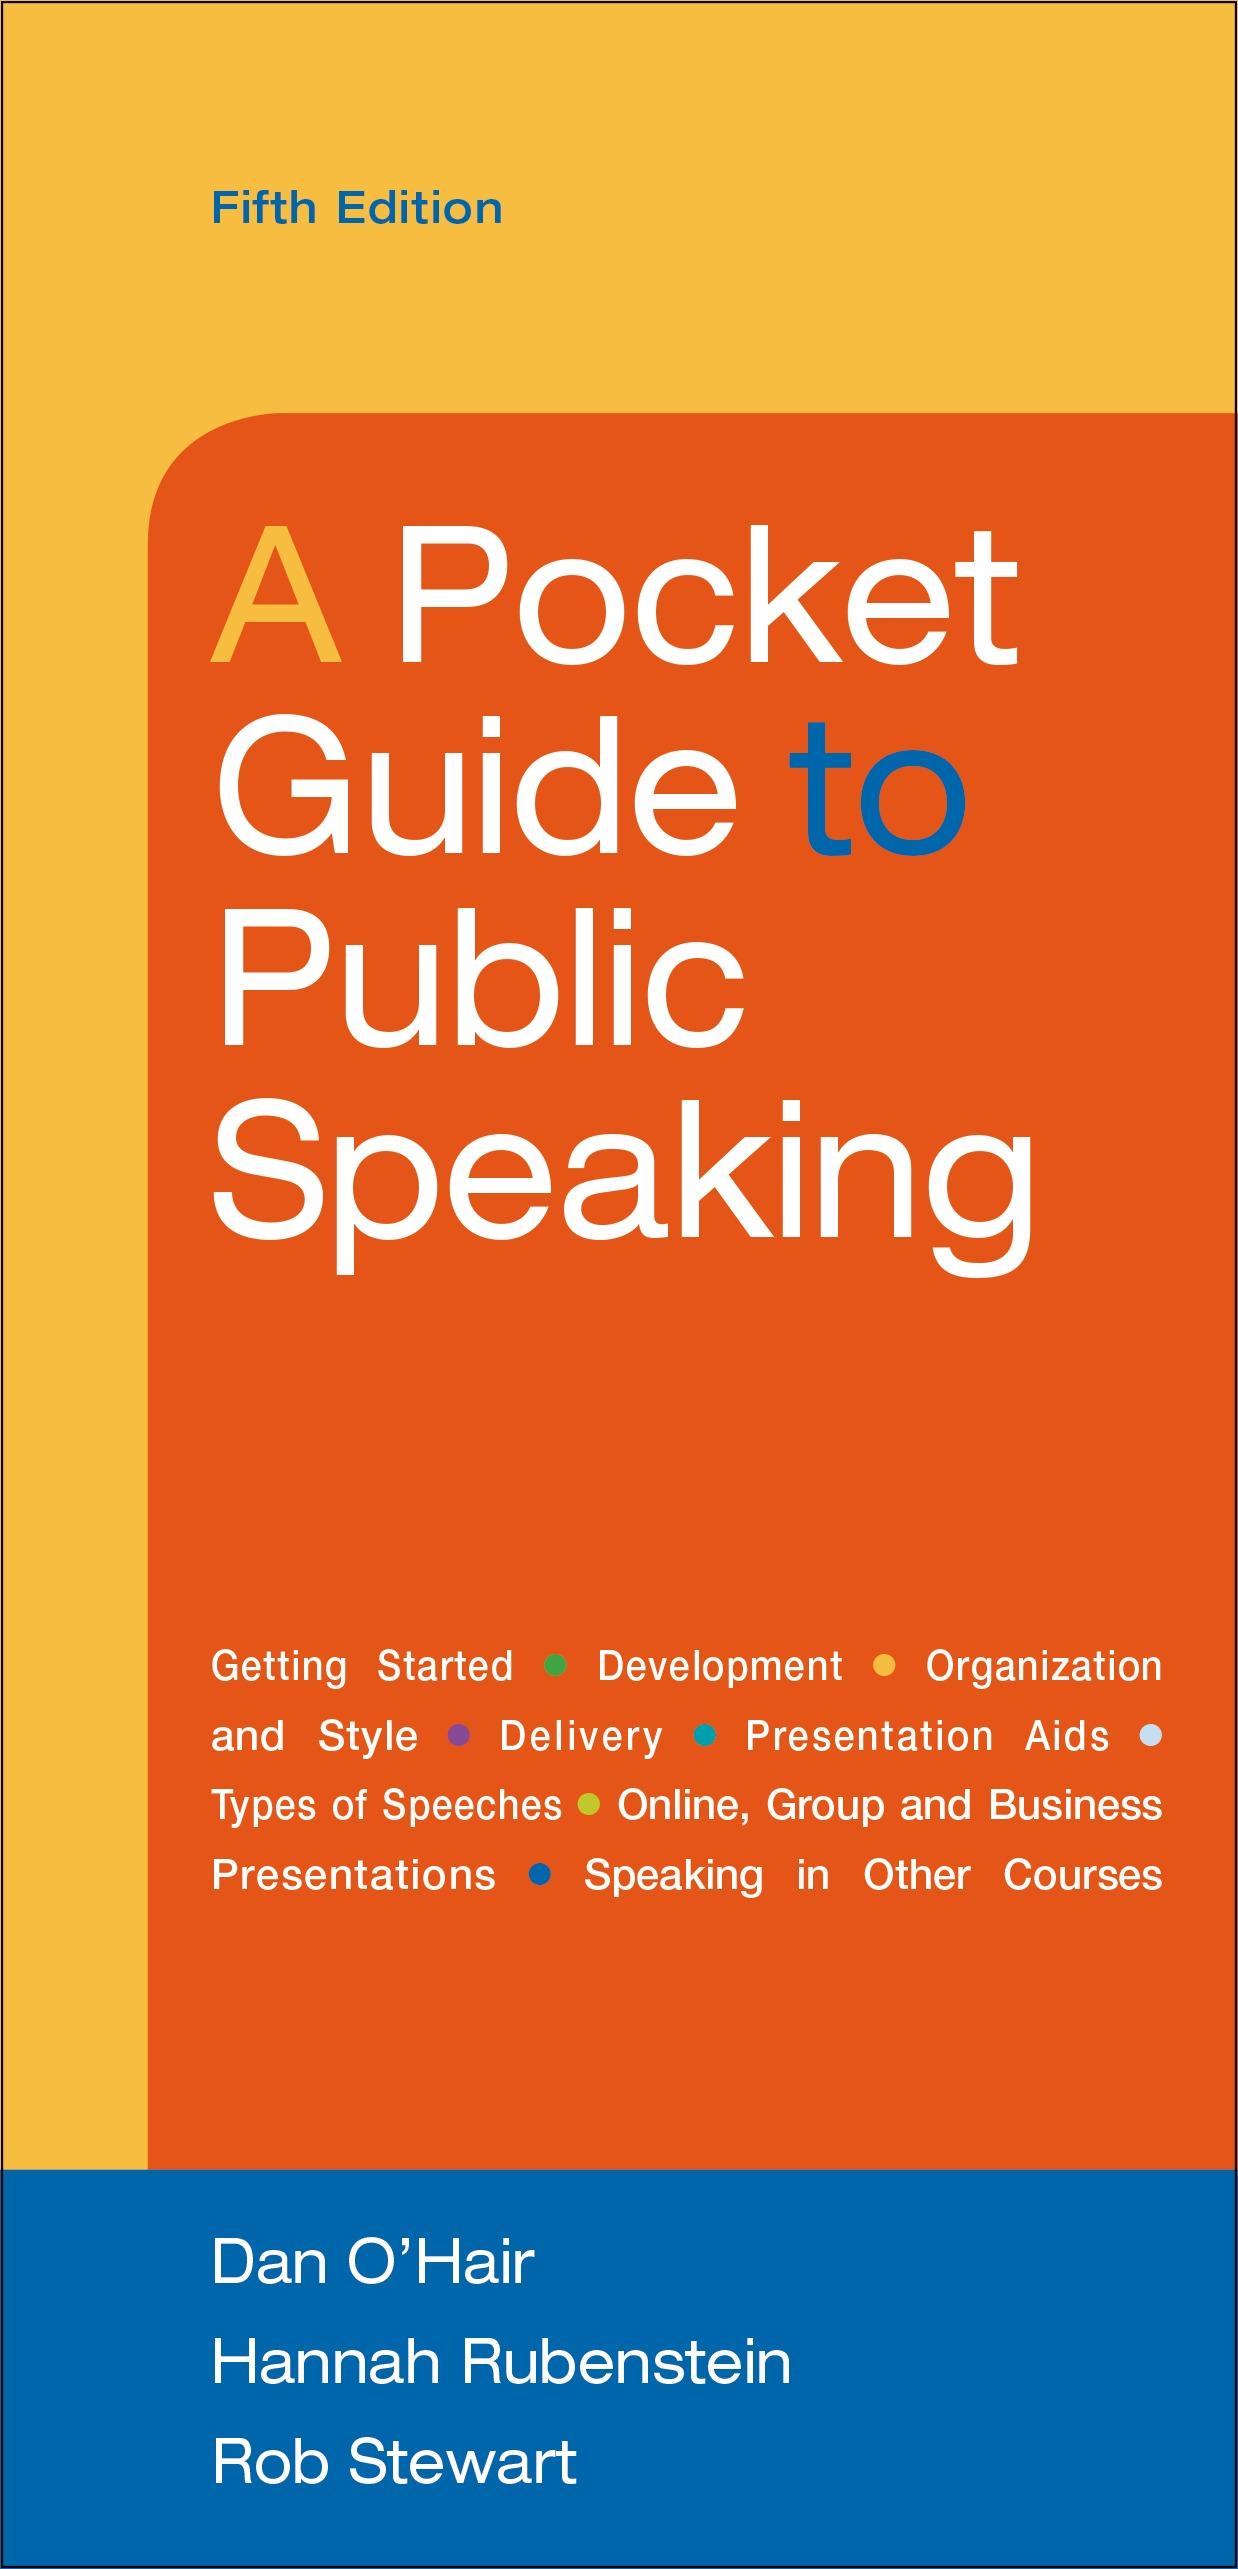 macmillan learning communicationpublic speaking rh macmillanlearning com a pocket guide to public speaking 4th a pocket guide to public speaking 4th